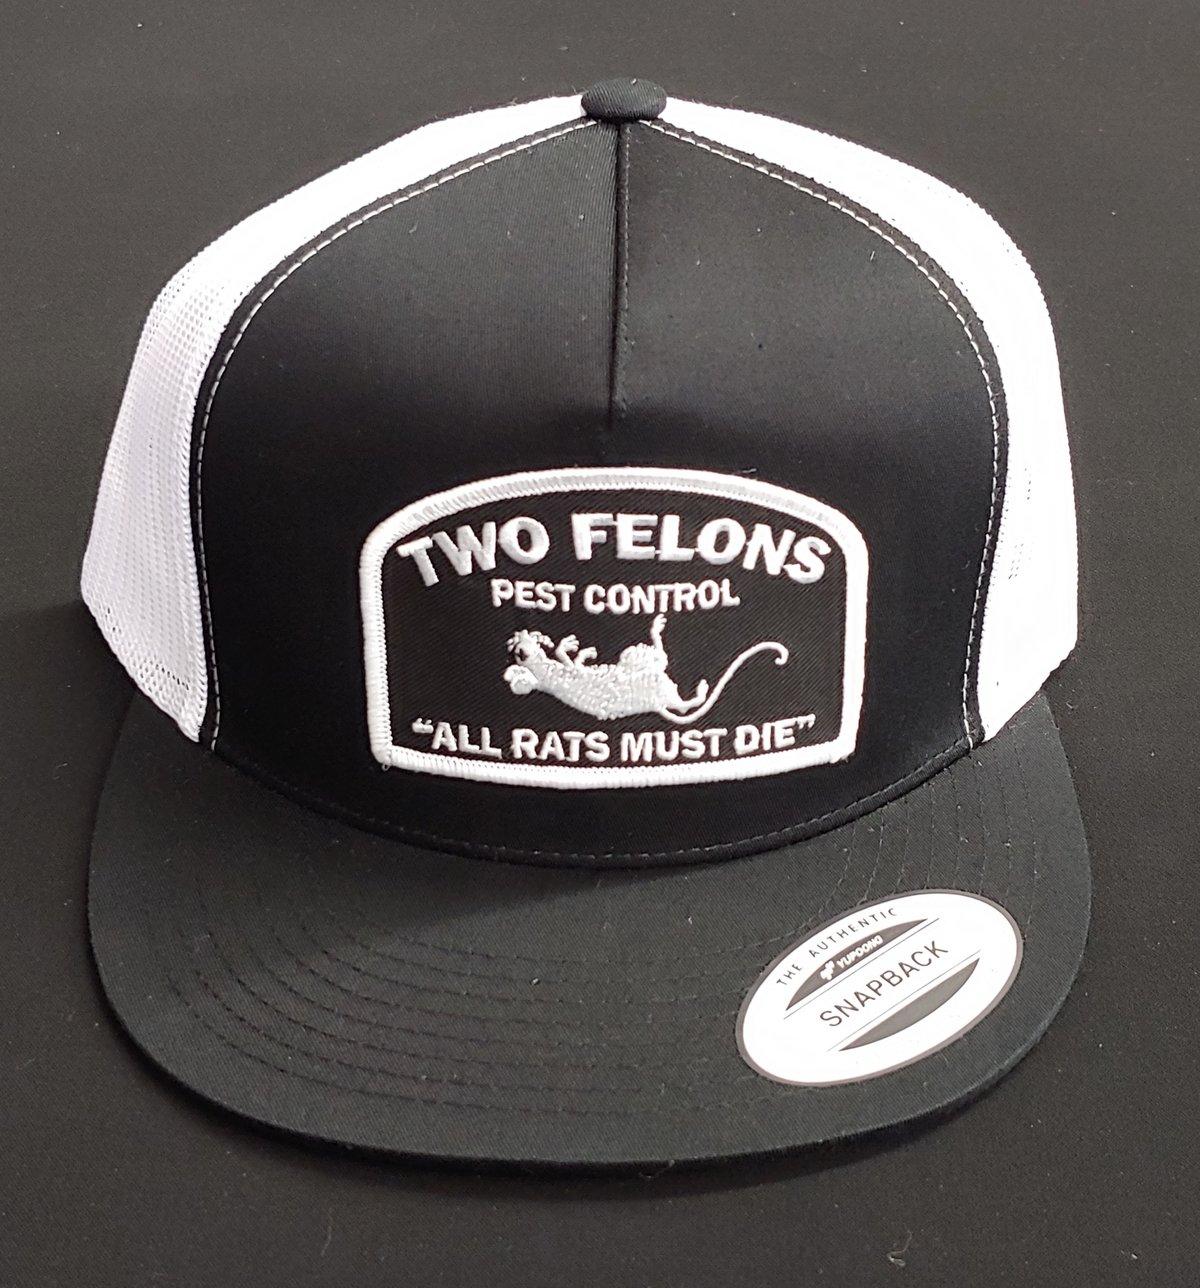 "Two Felons ""Pest Control"" V1 trucker (b/w)"